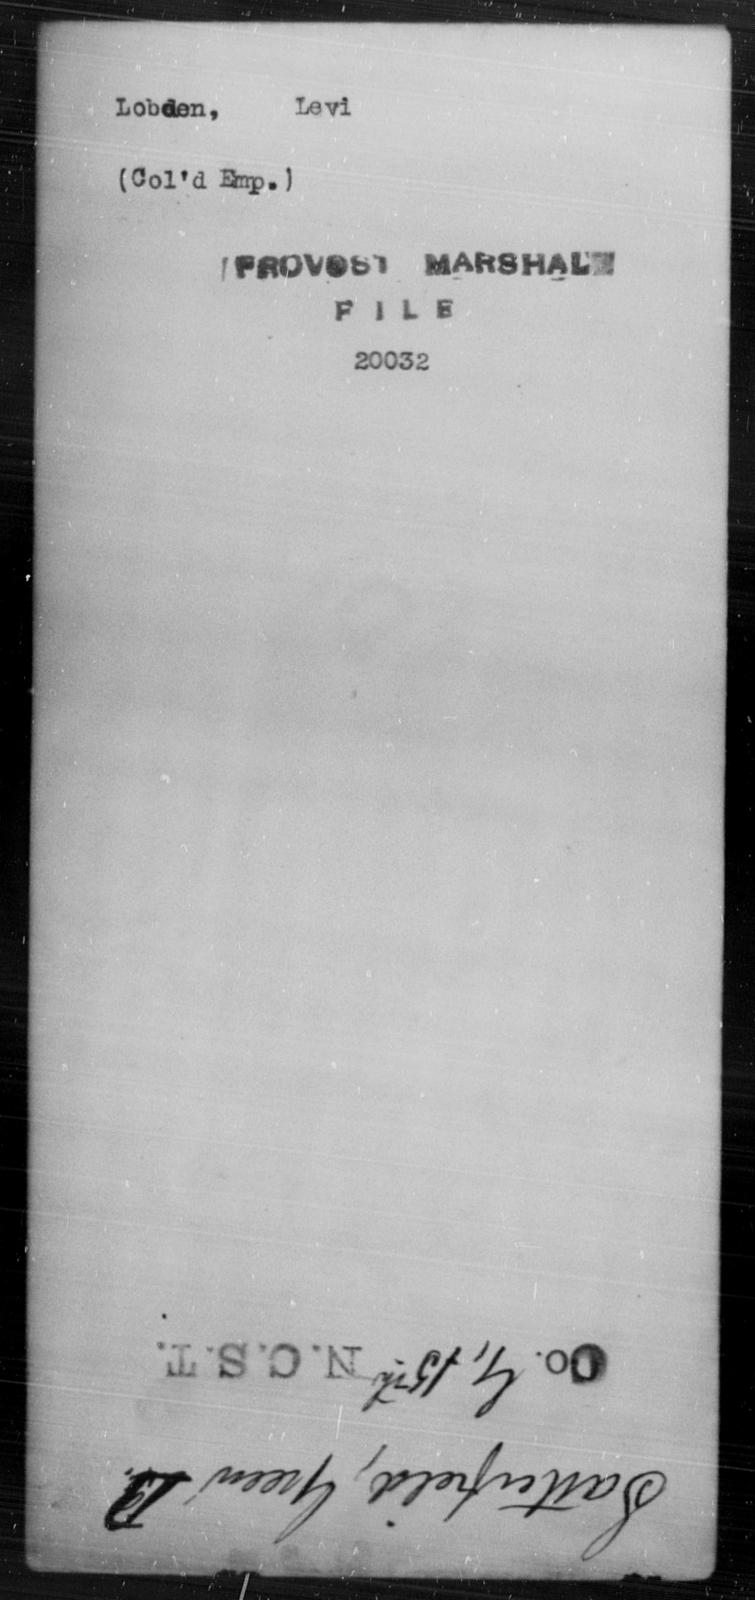 Lobden, Levi - State: [Blank] - Year: [Blank]